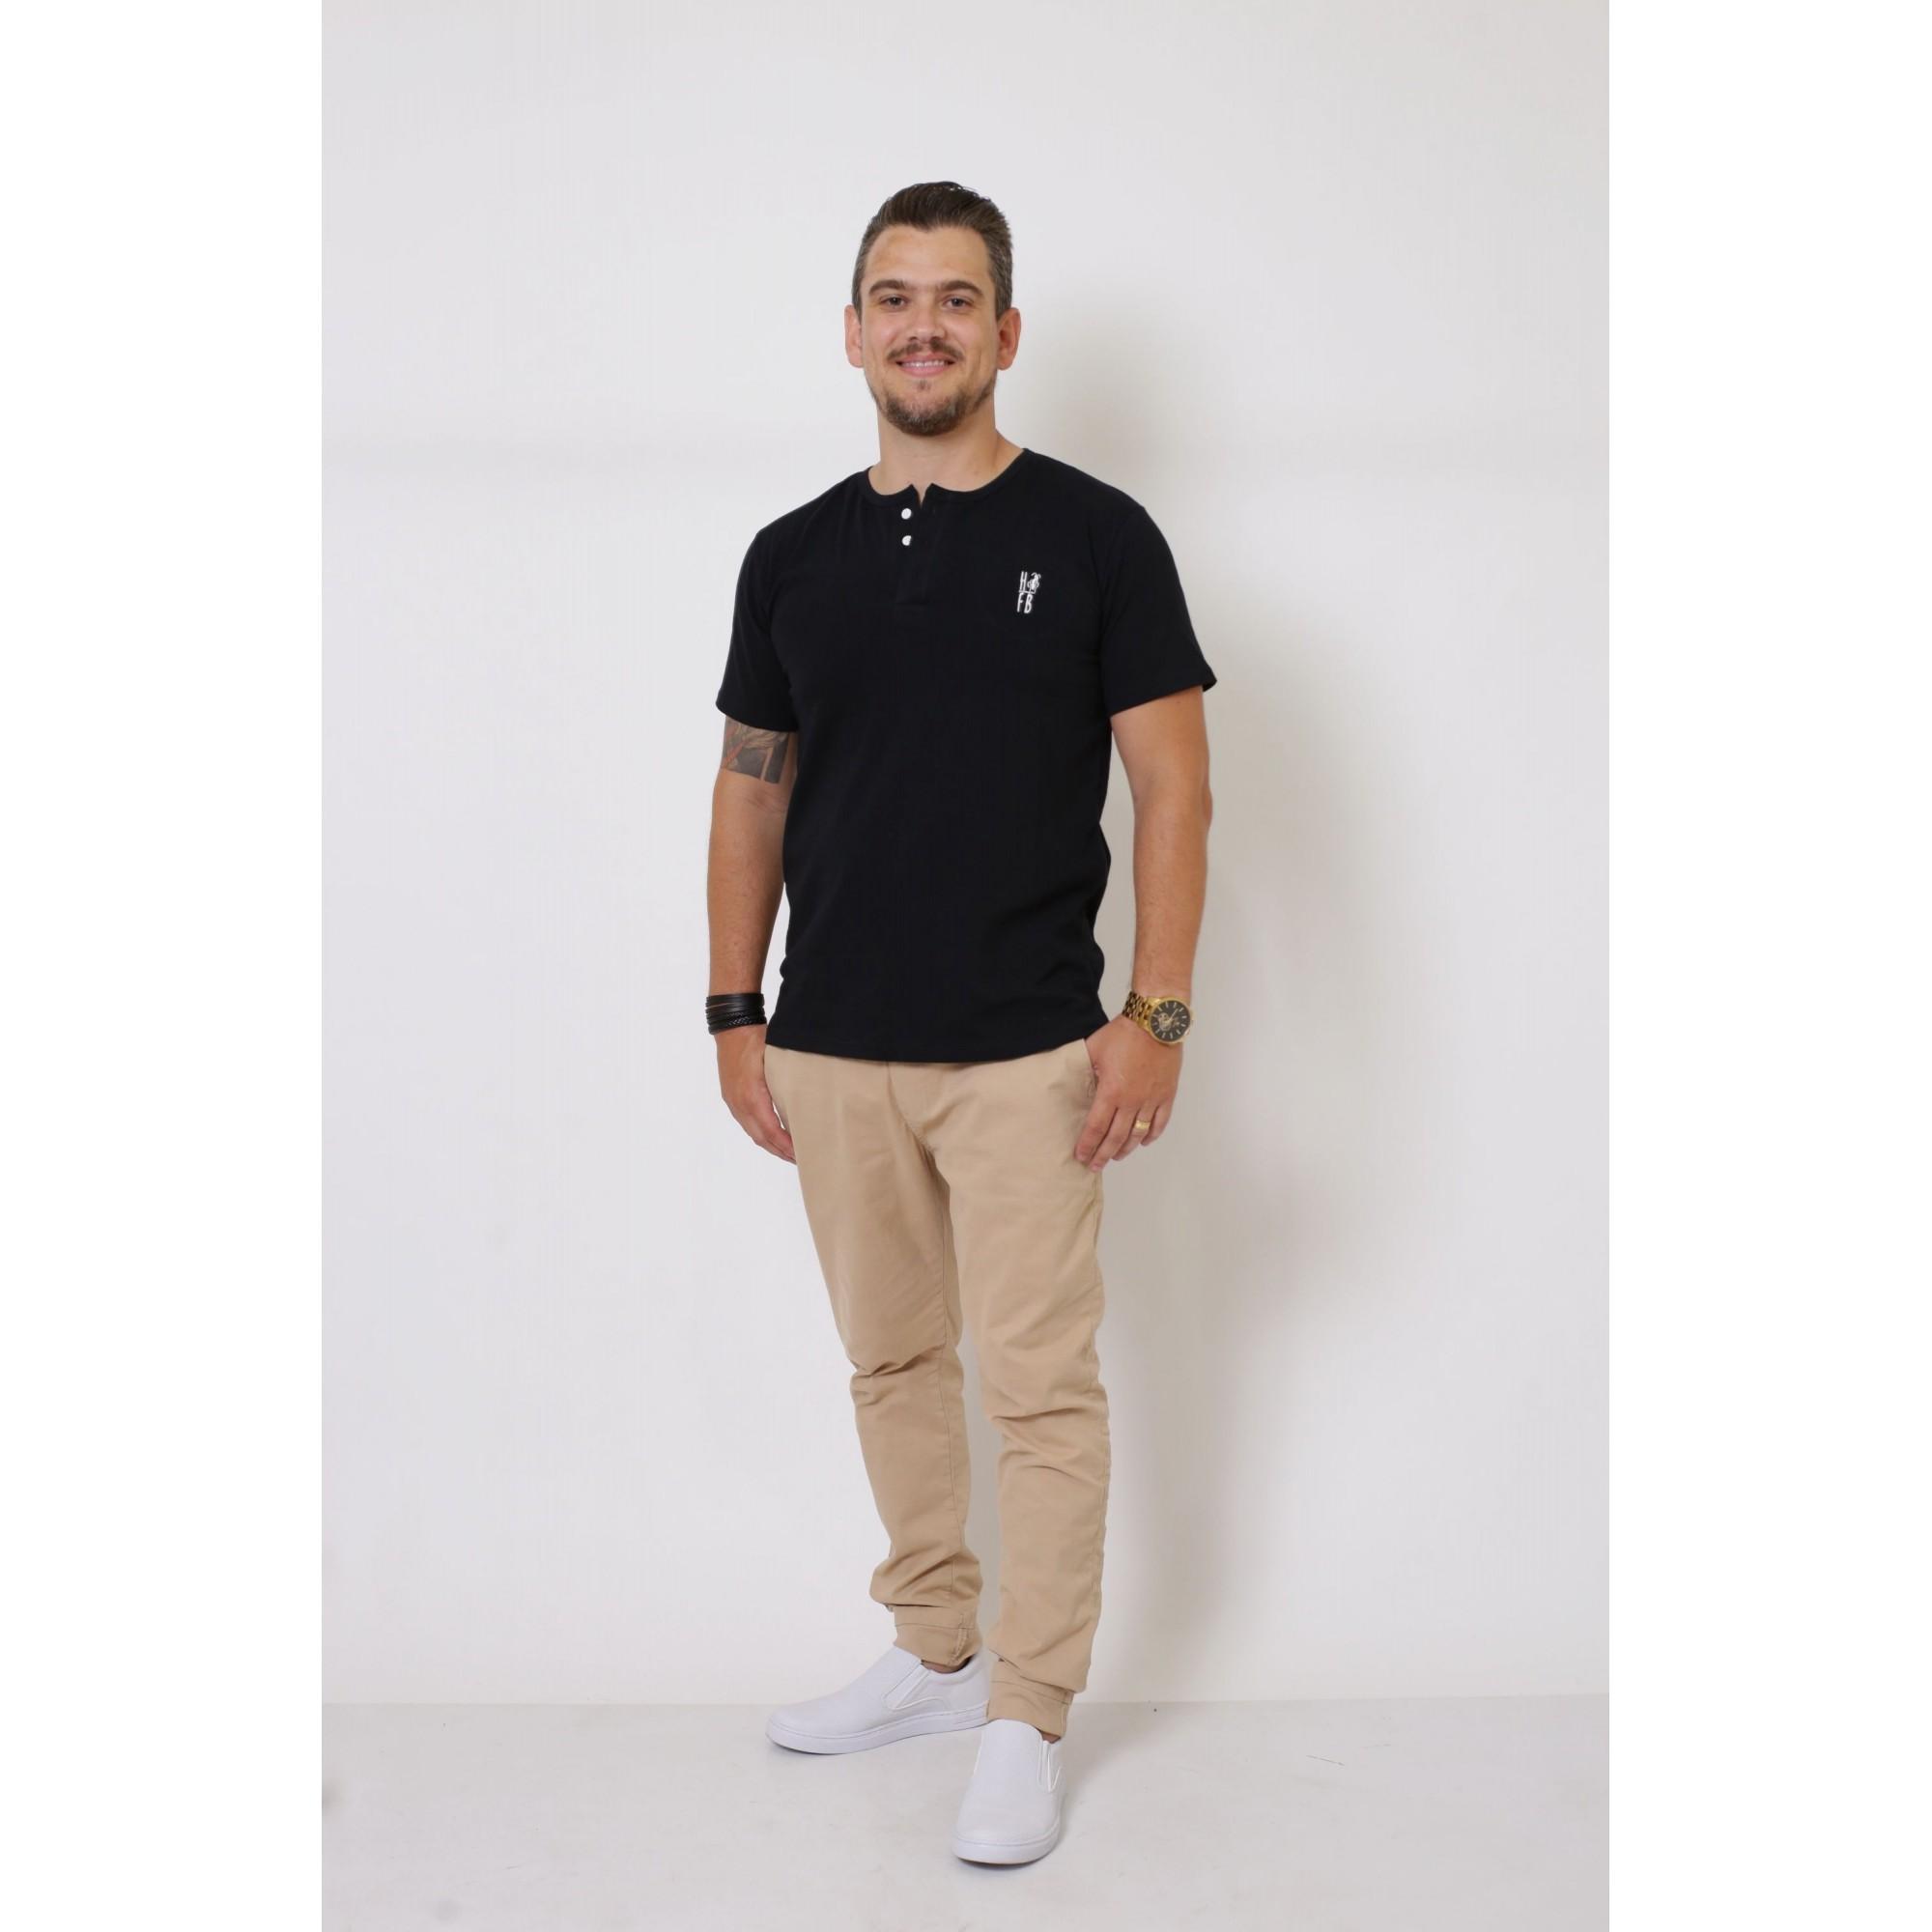 T-Shirt Henley Masculina Preta  - Heitor Fashion Brazil